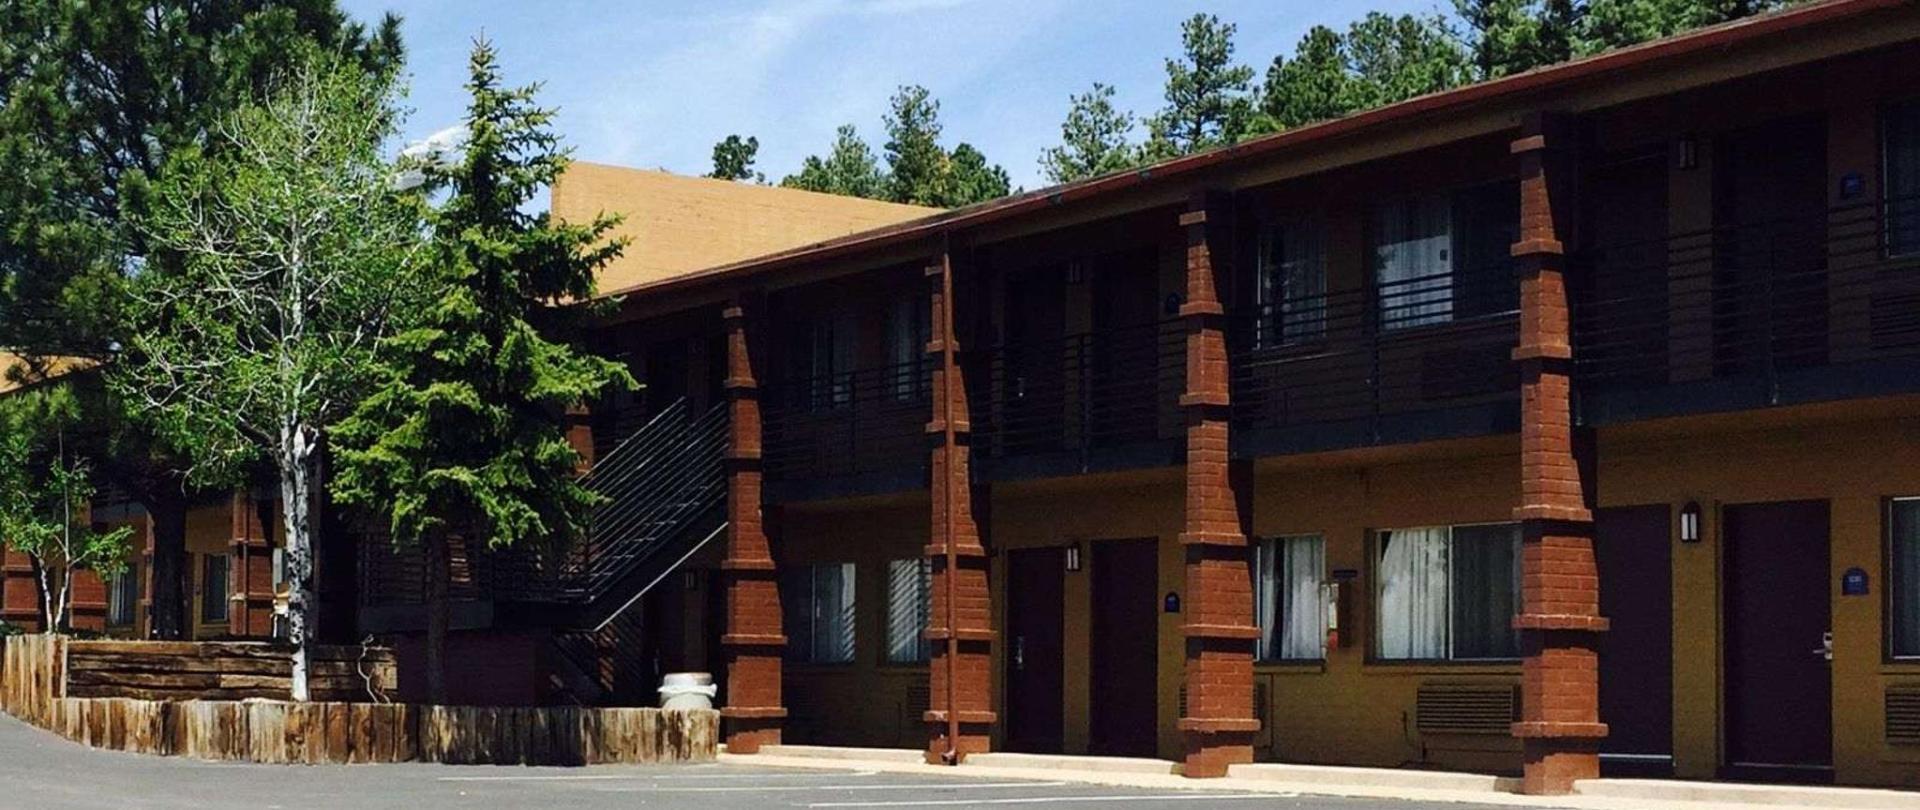 Hotel Aspen Flagstaff Grand Canyon Innsuites Flagstaff